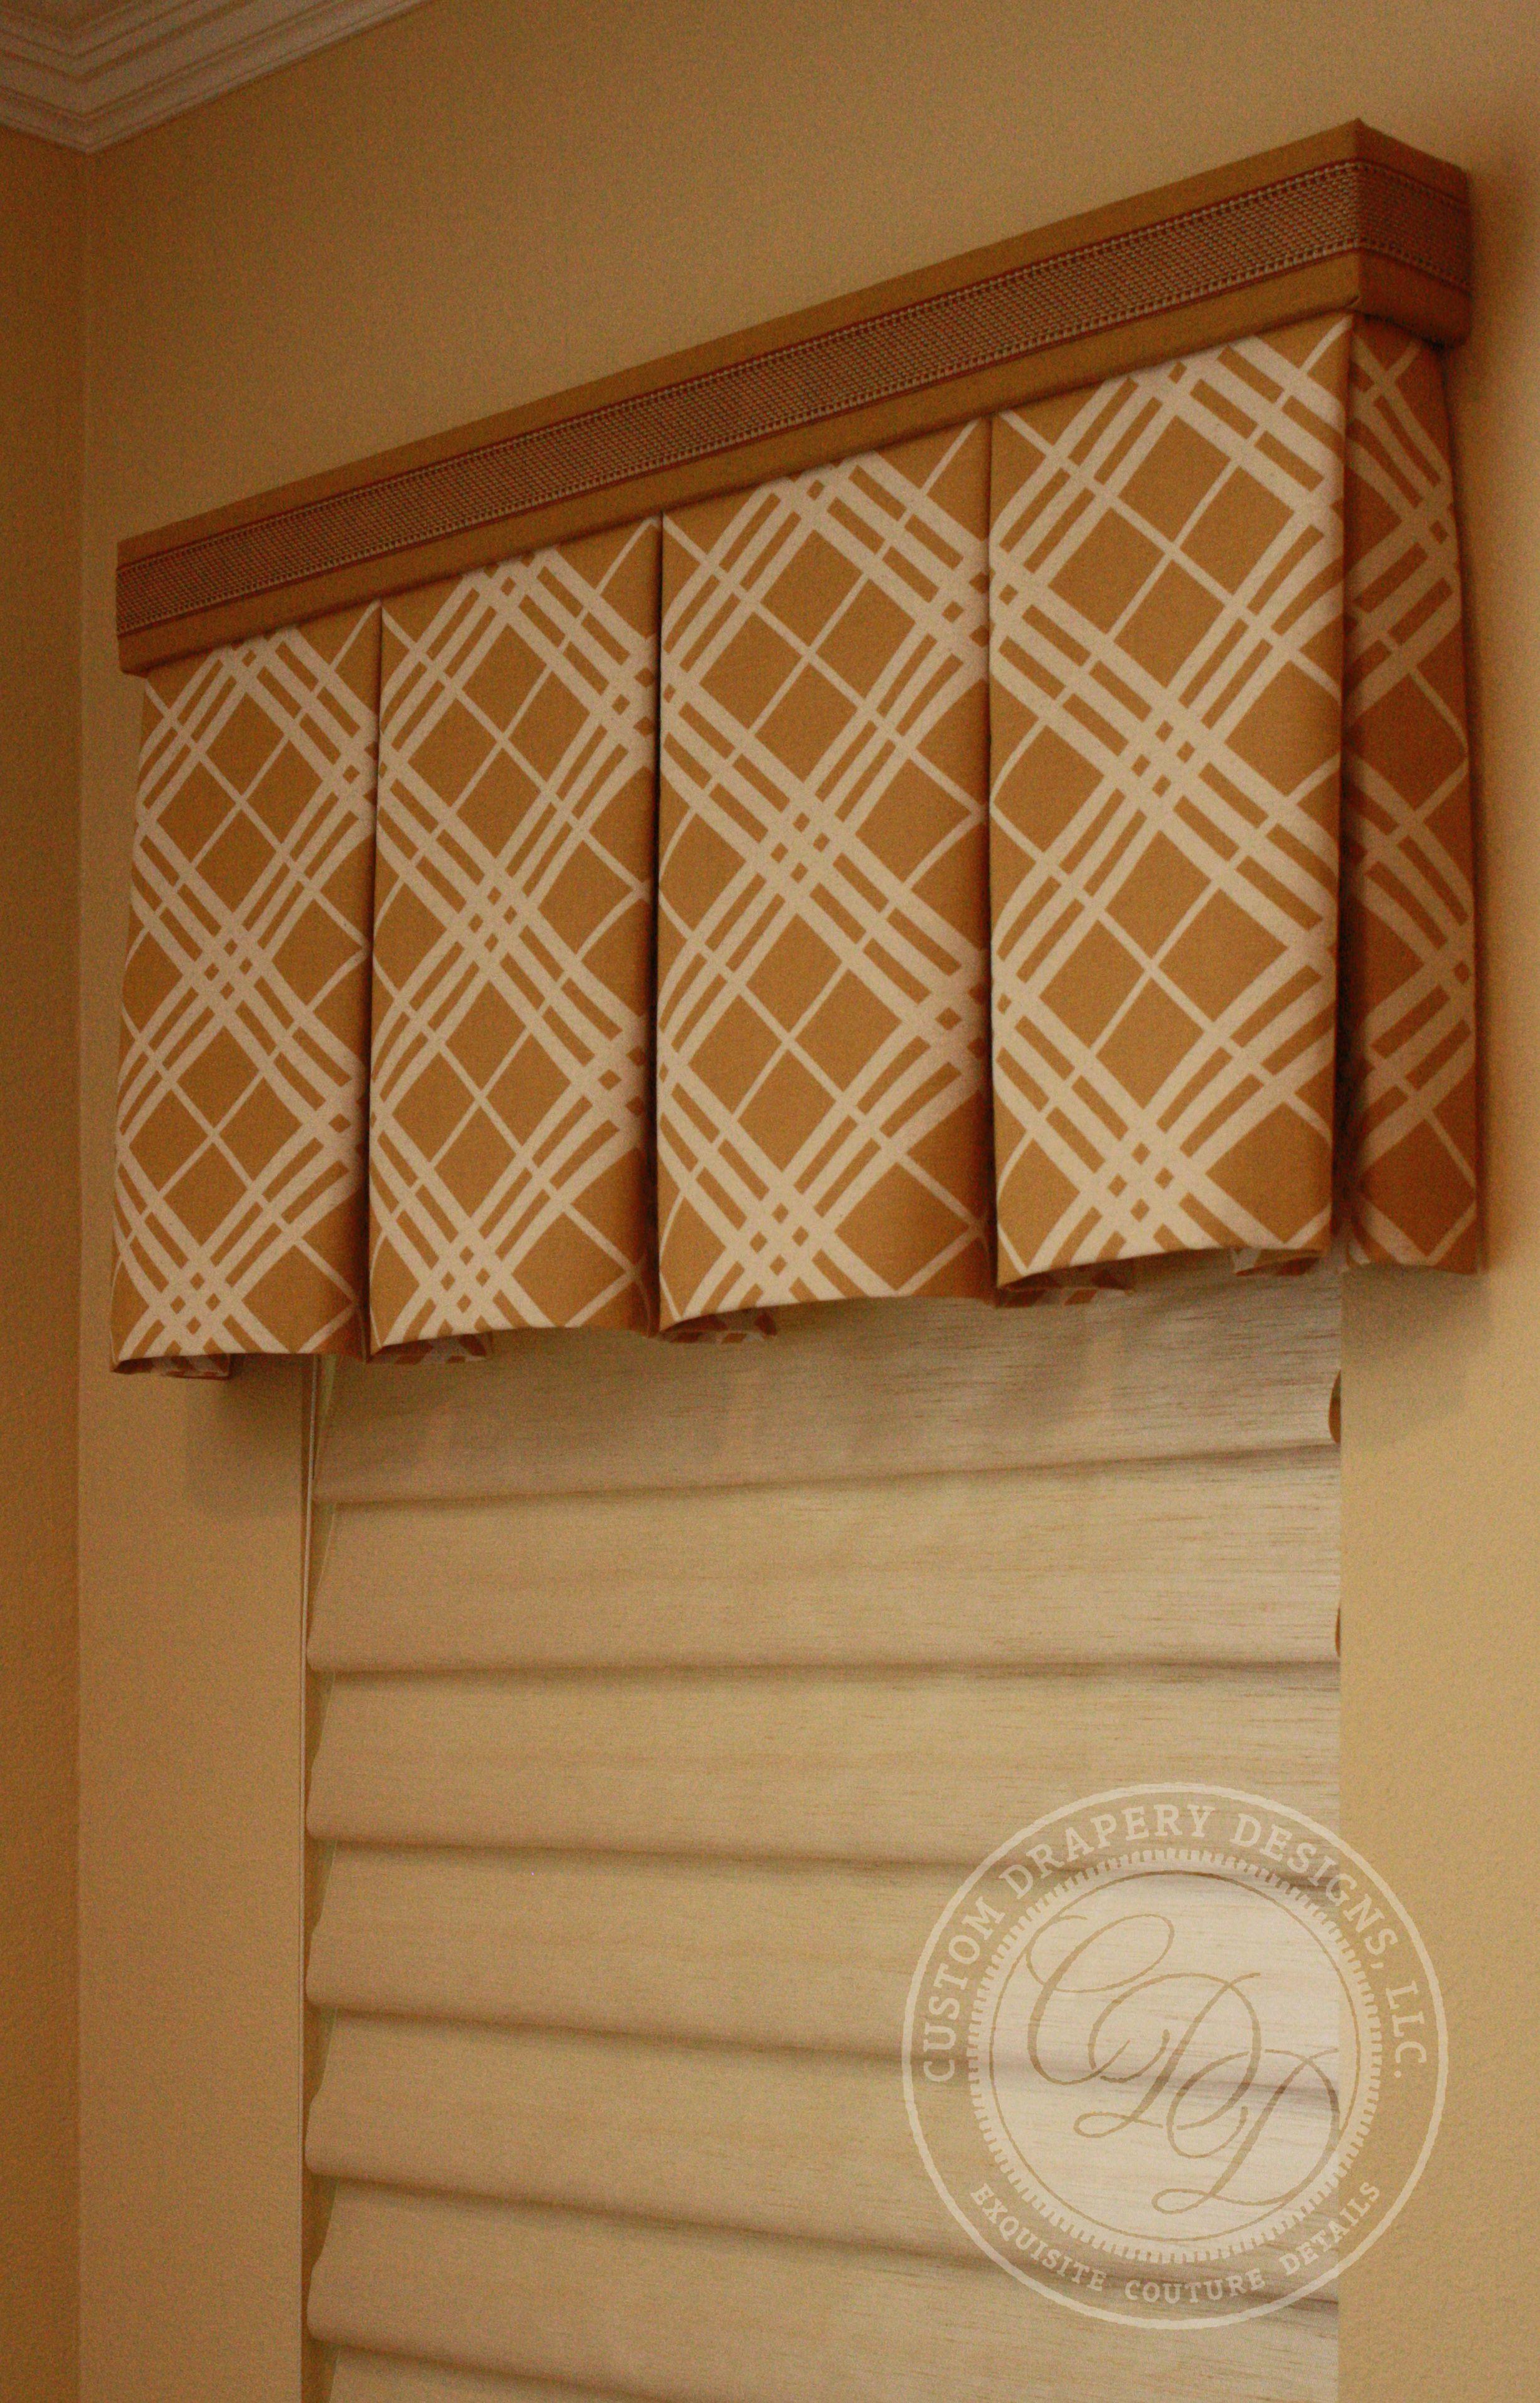 Custom Drapery Designs, LLC. - Valances | Window treatments ...